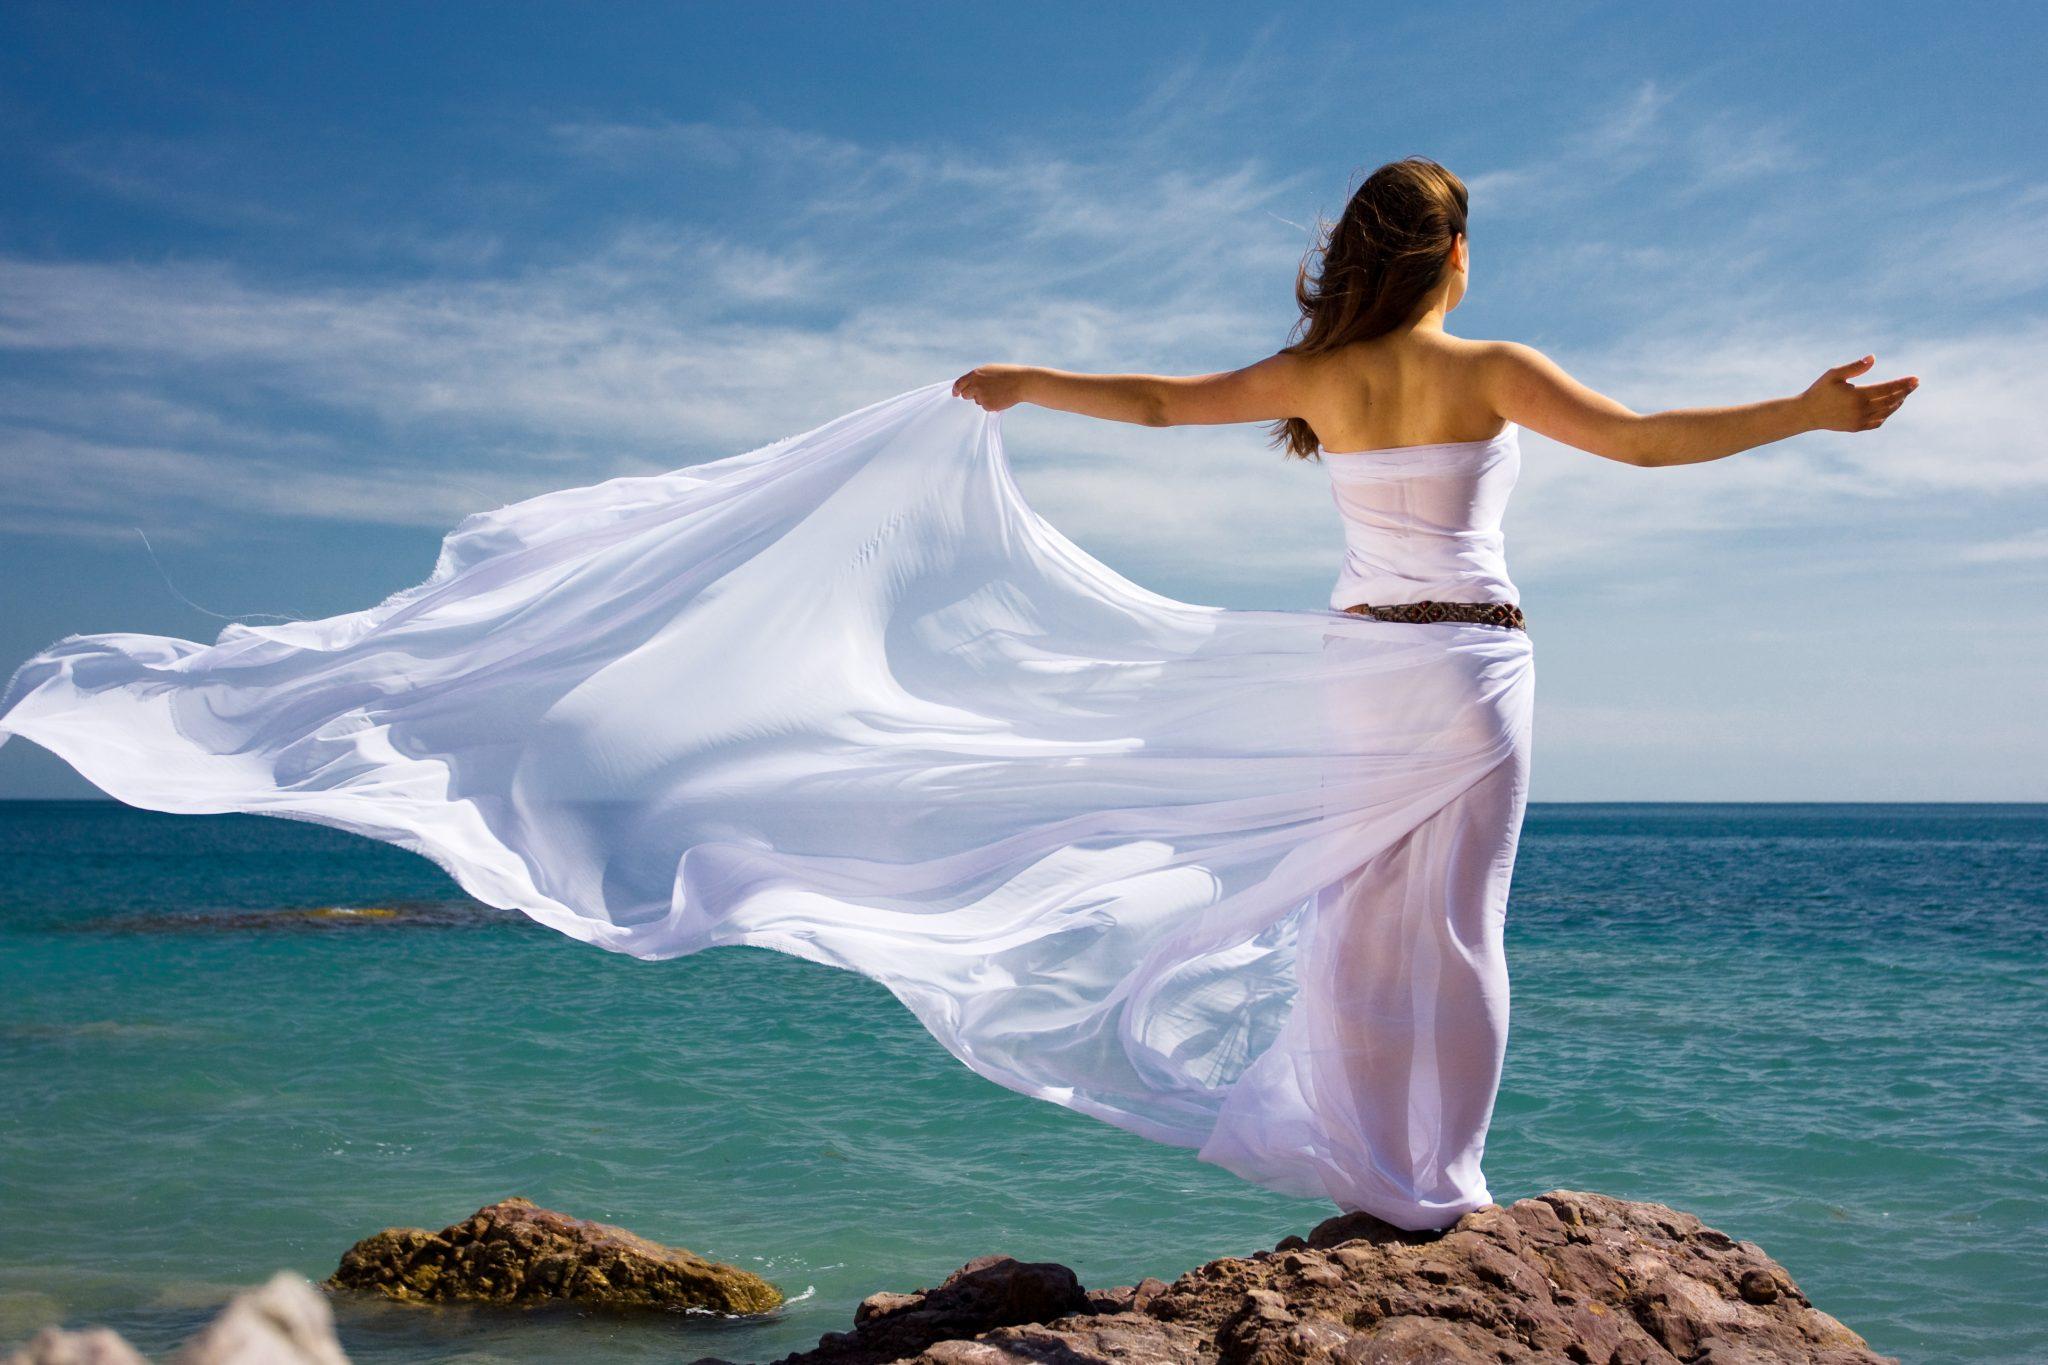 ocean woman wetter water